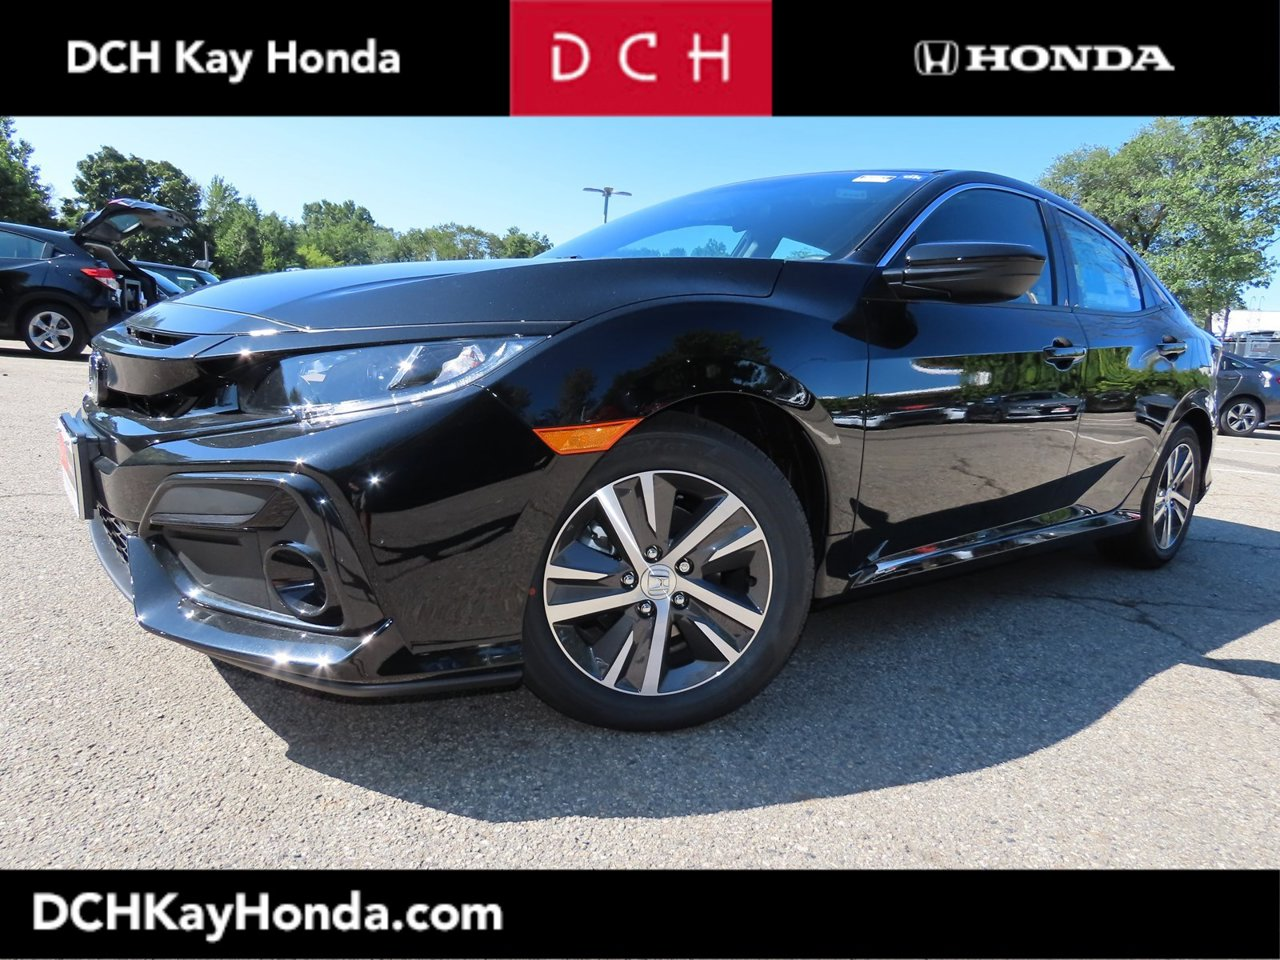 New 2020 Honda Civic Hatchback in Eatontown, NJ